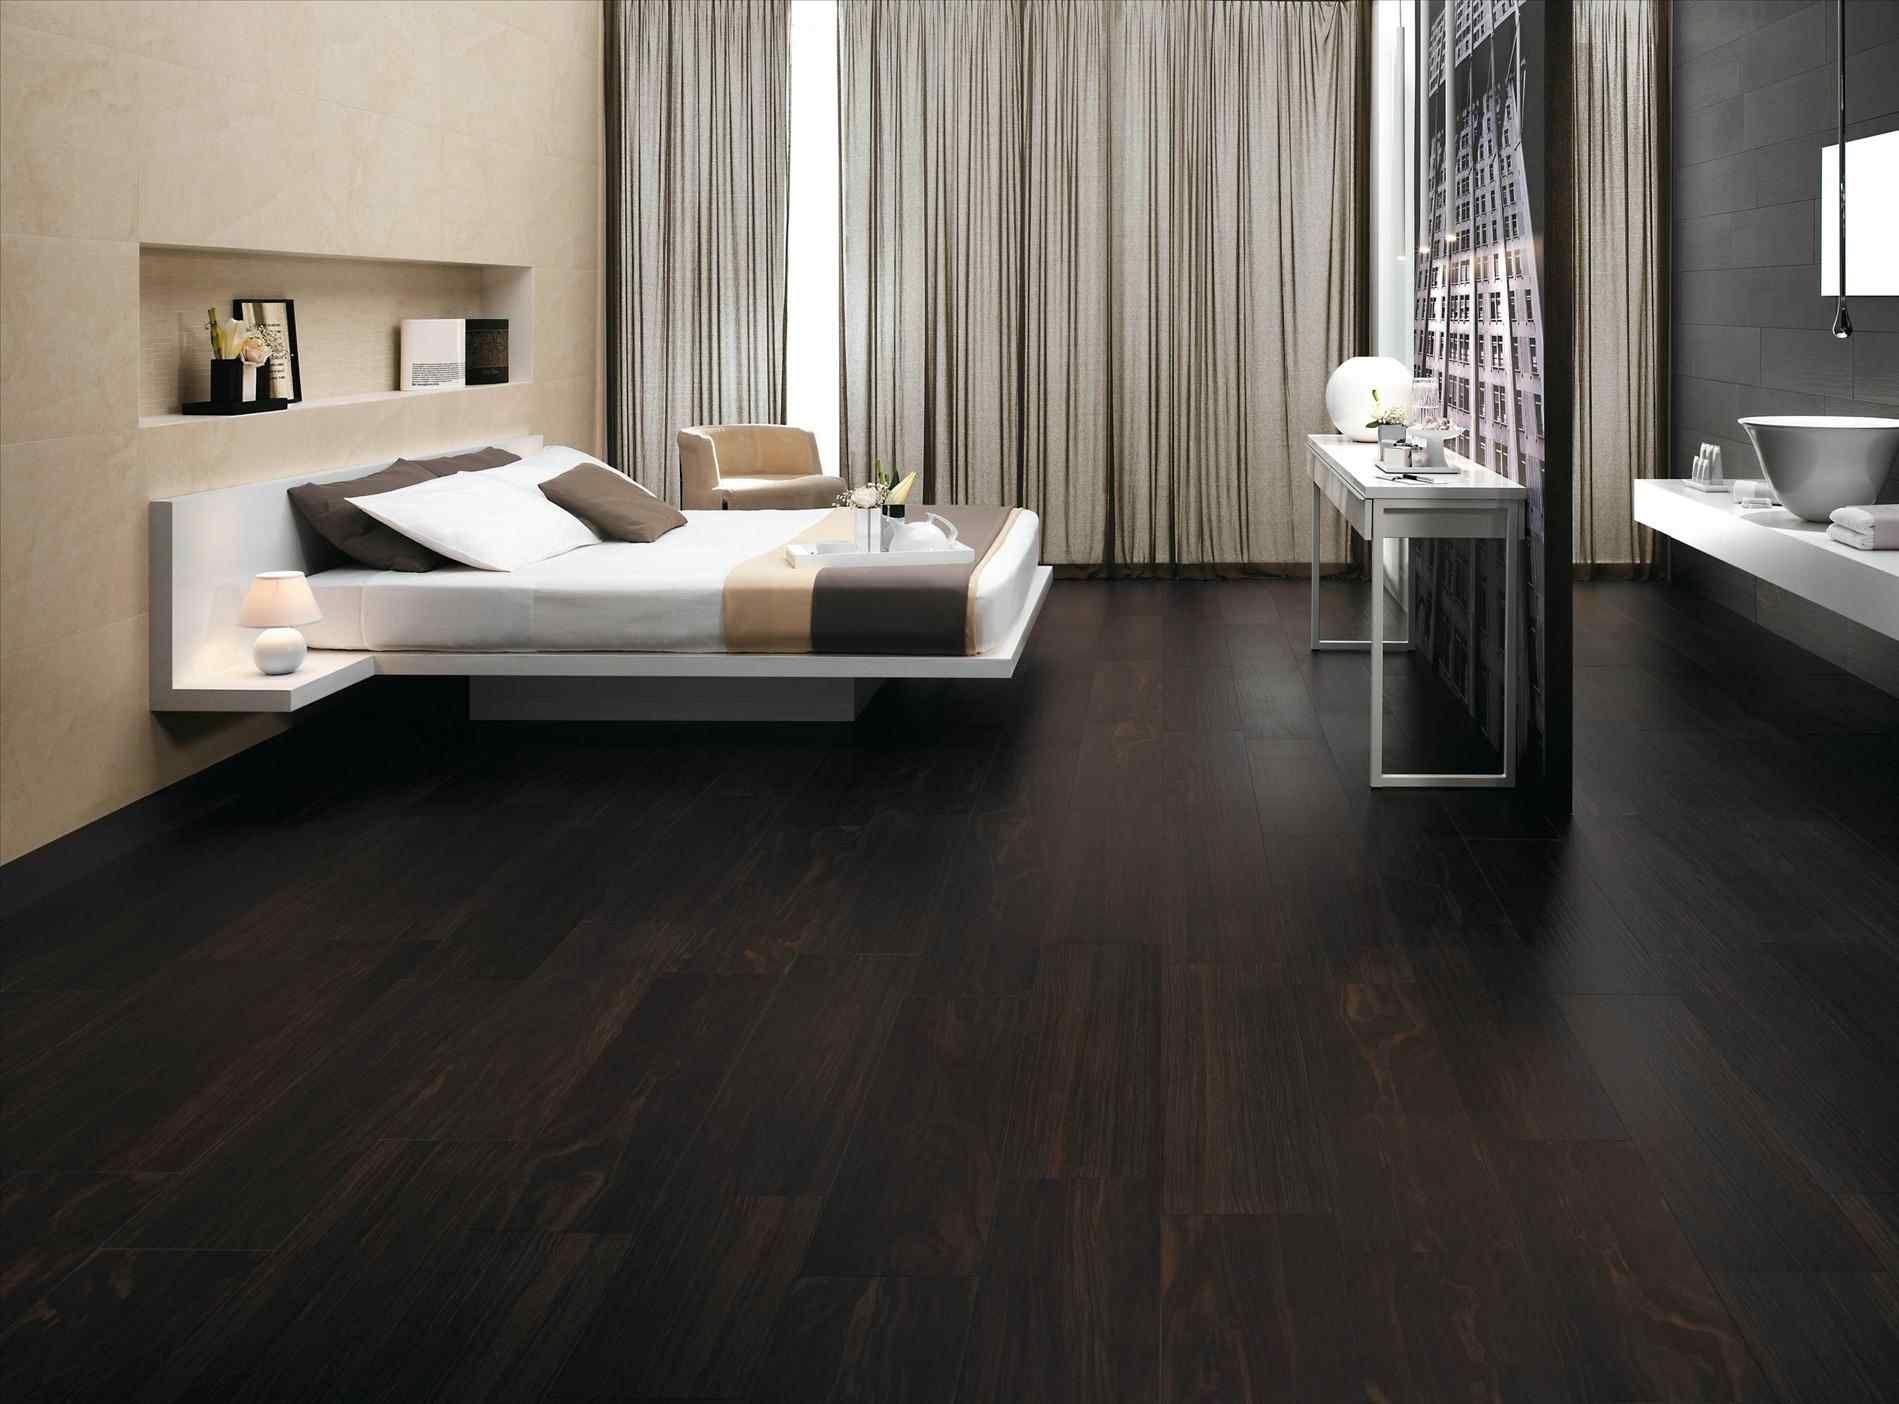 Modern Bedroom Flooring Tiles Tile Bedroom Bedroom Flooring